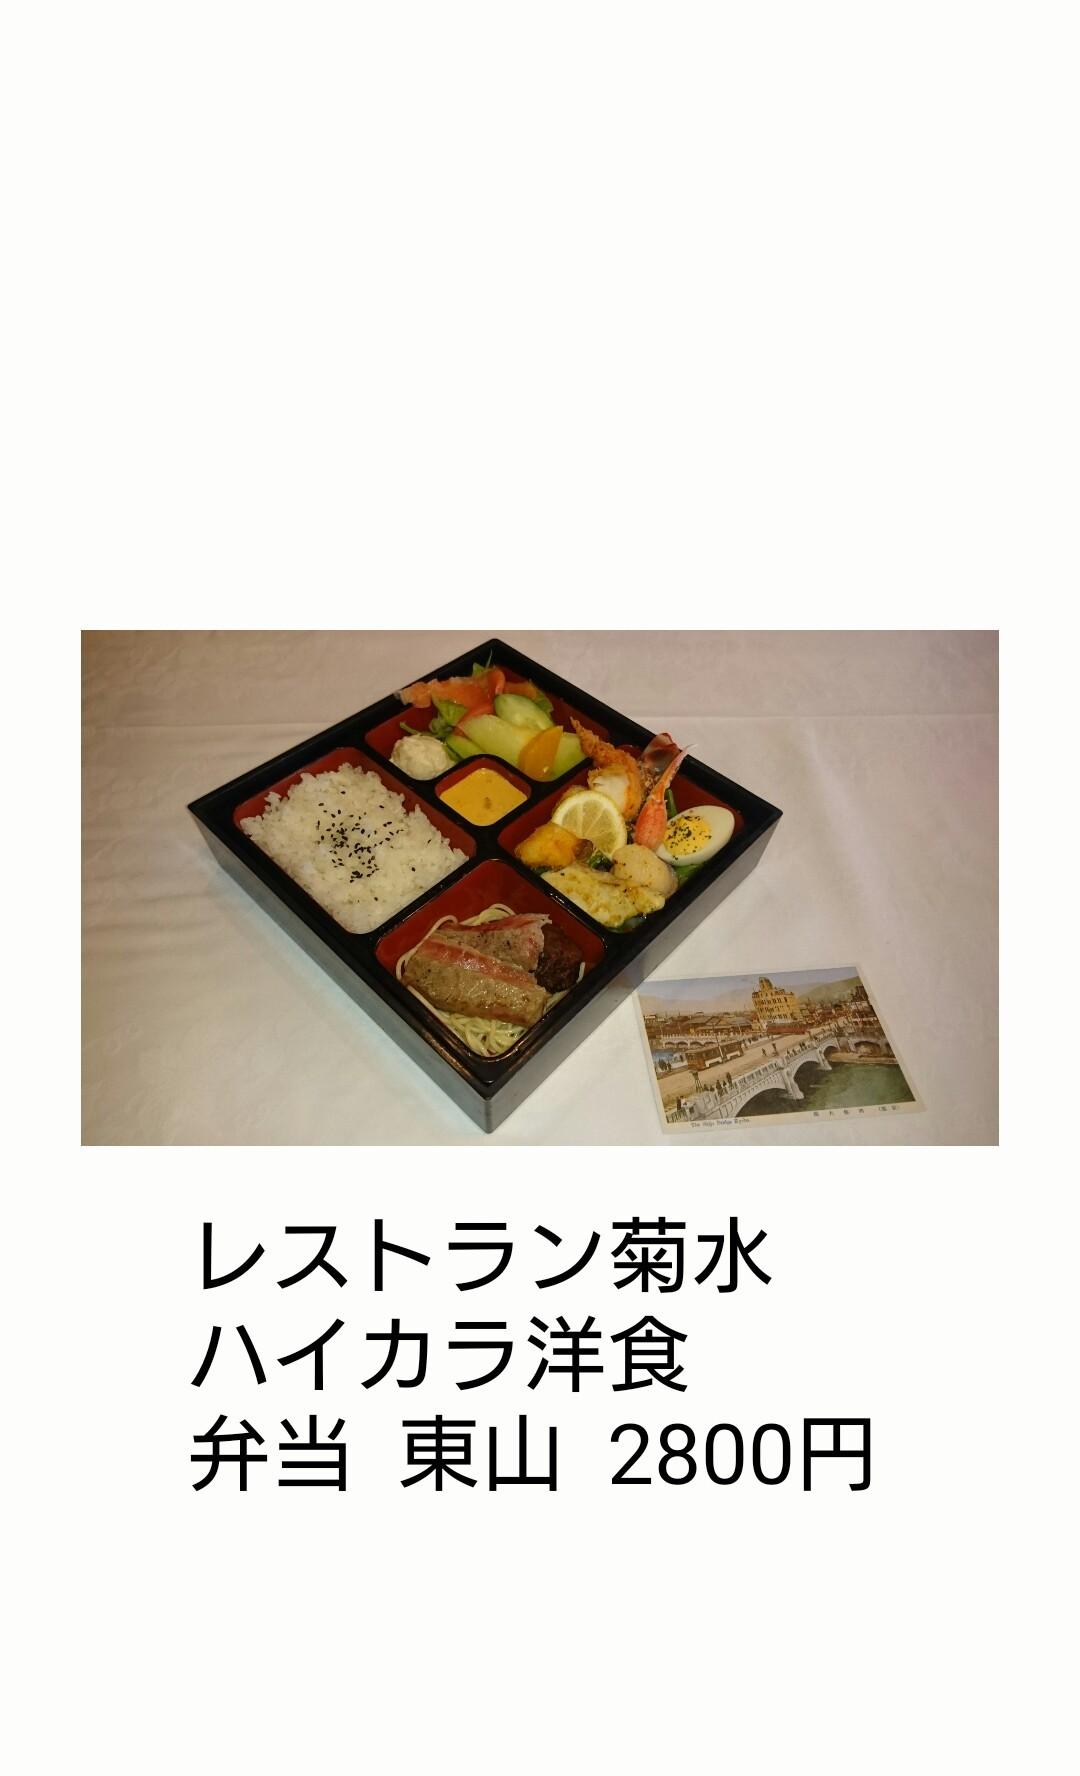 ROHM シアター 顔見世興行観劇弁当 レストラン菊水    _d0162300_12402420.jpg